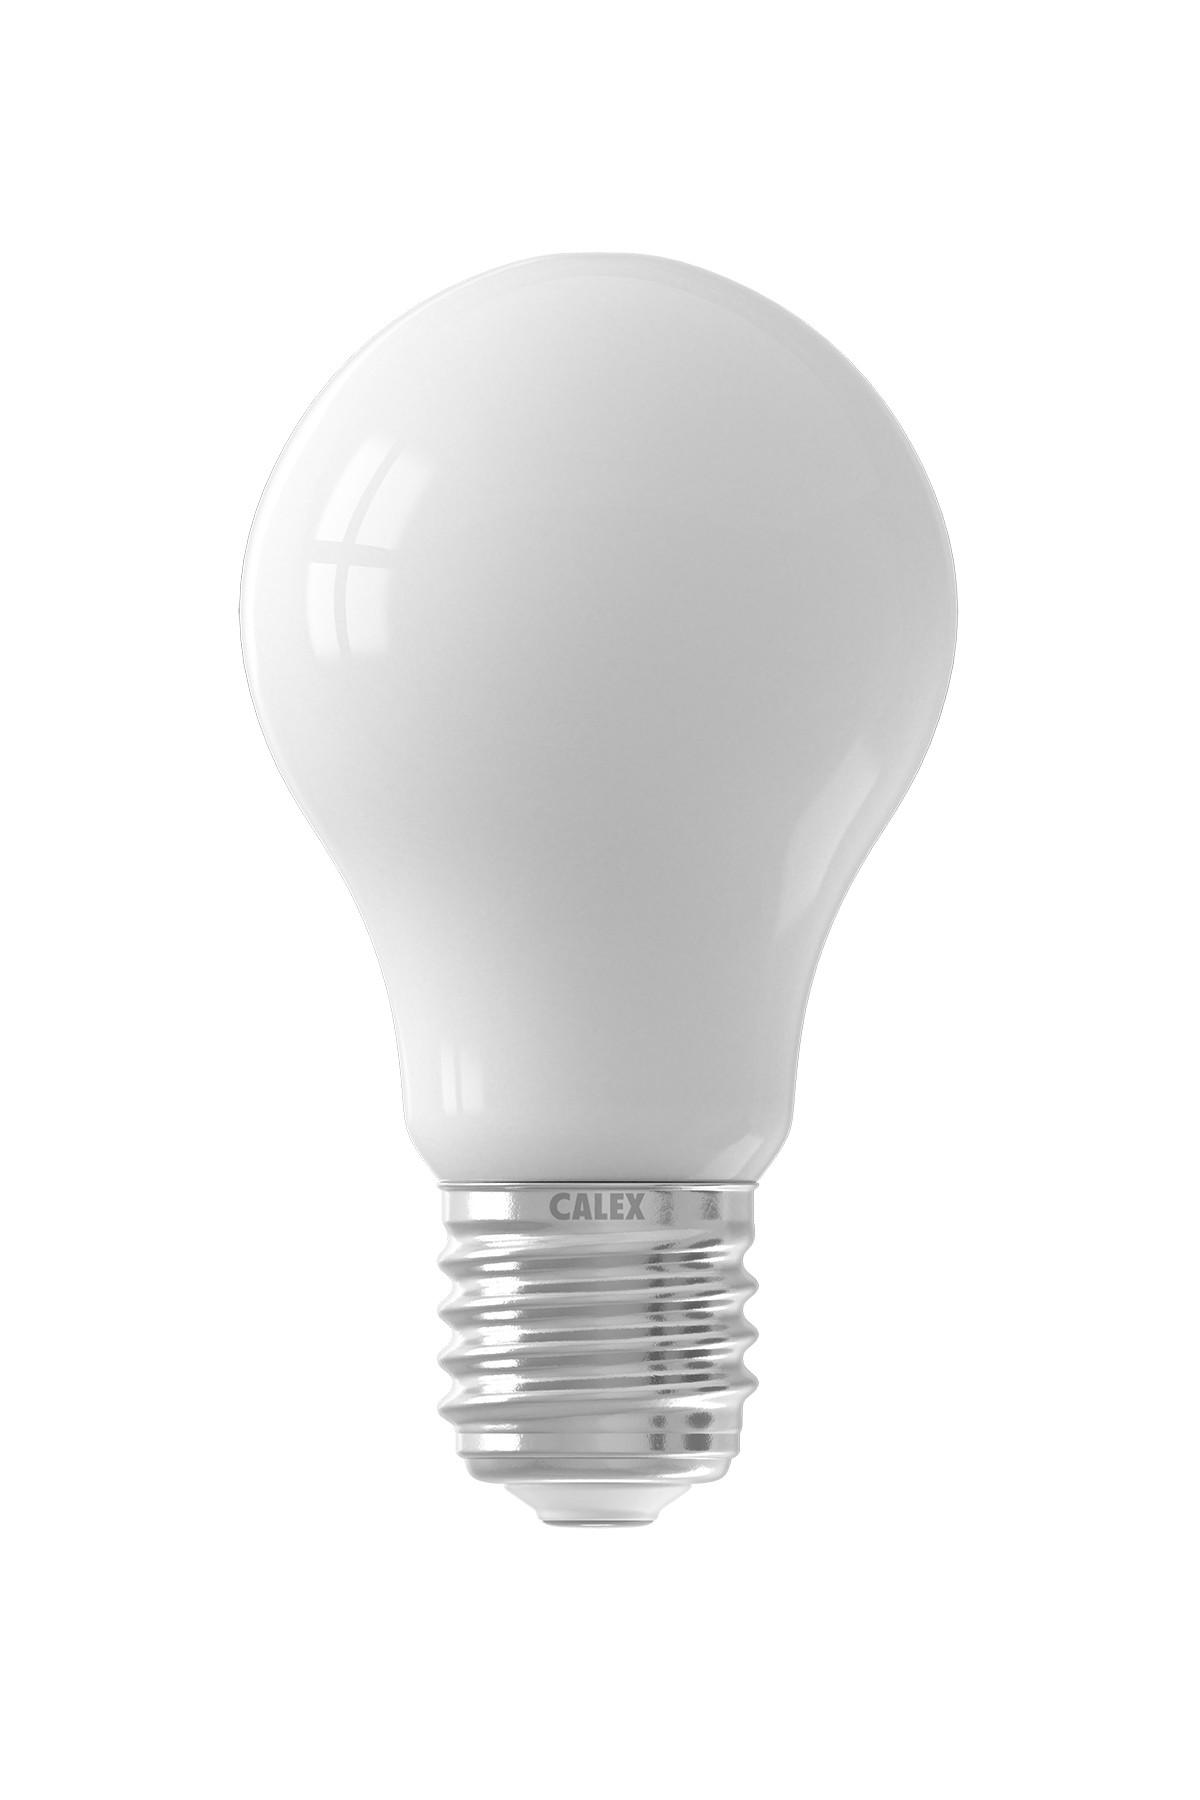 Calex LED Full Glass Filament GLS-lamp  220-240V 7W 810lm E27 A60, Softline 2700K CRI80 Dimmable